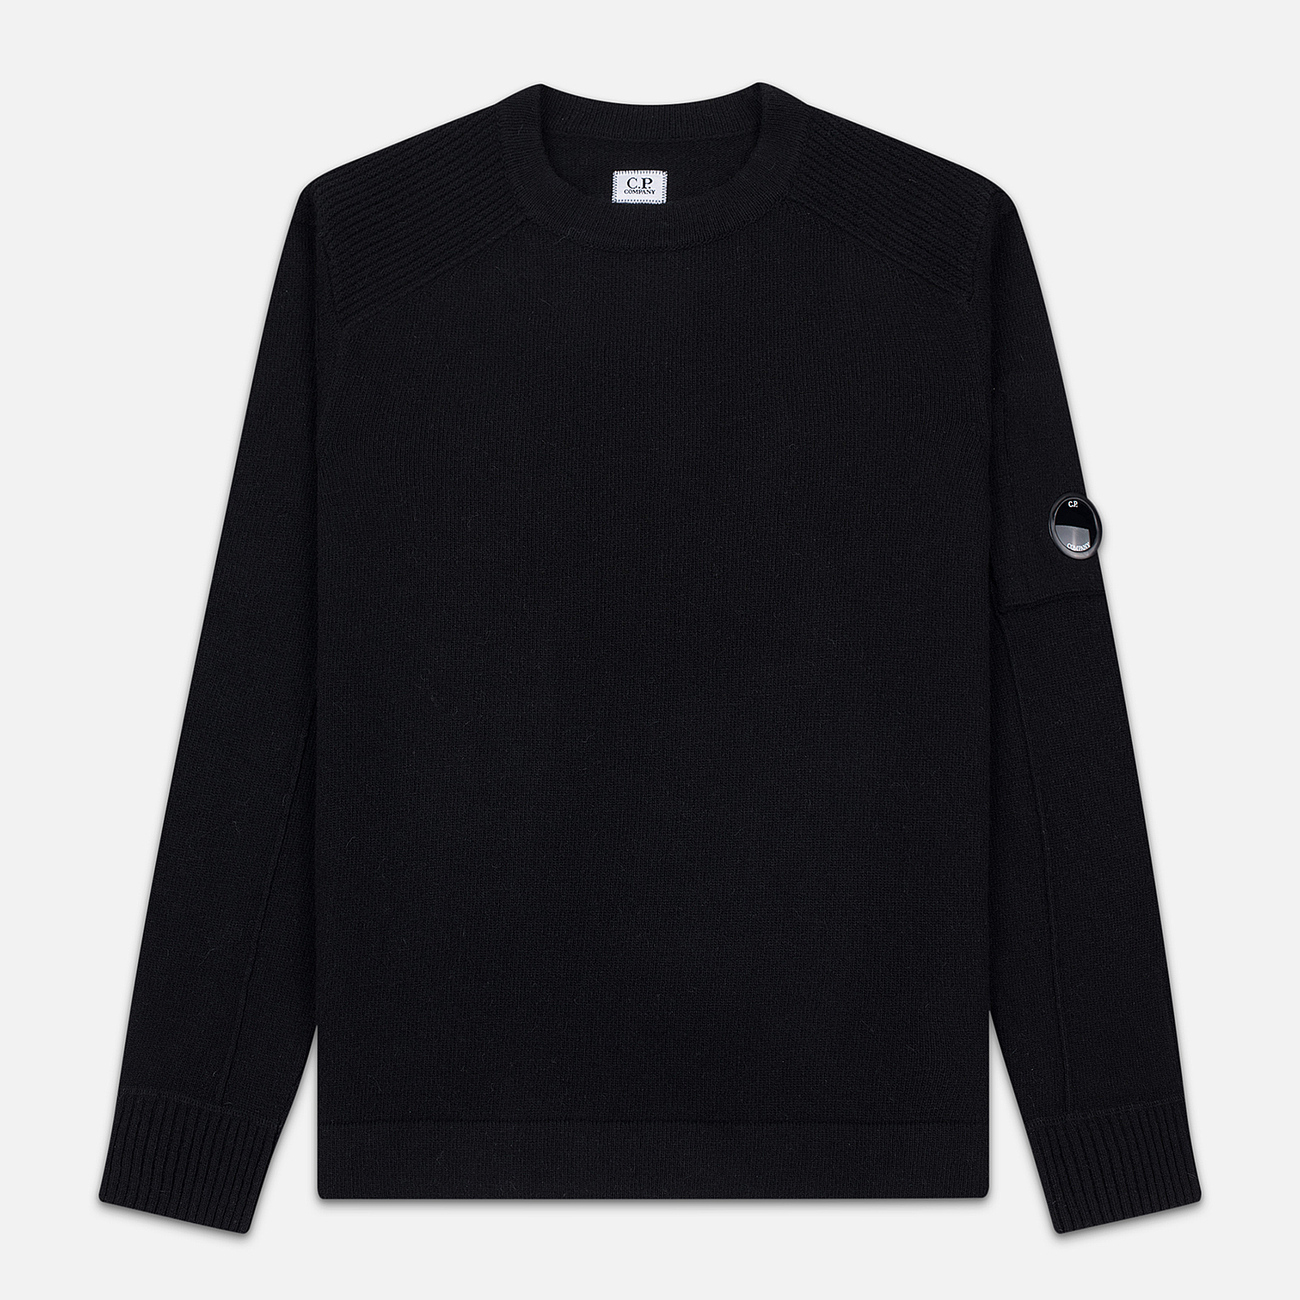 Мужской свитер C.P. Company Crew Neck Lens Pocket Black